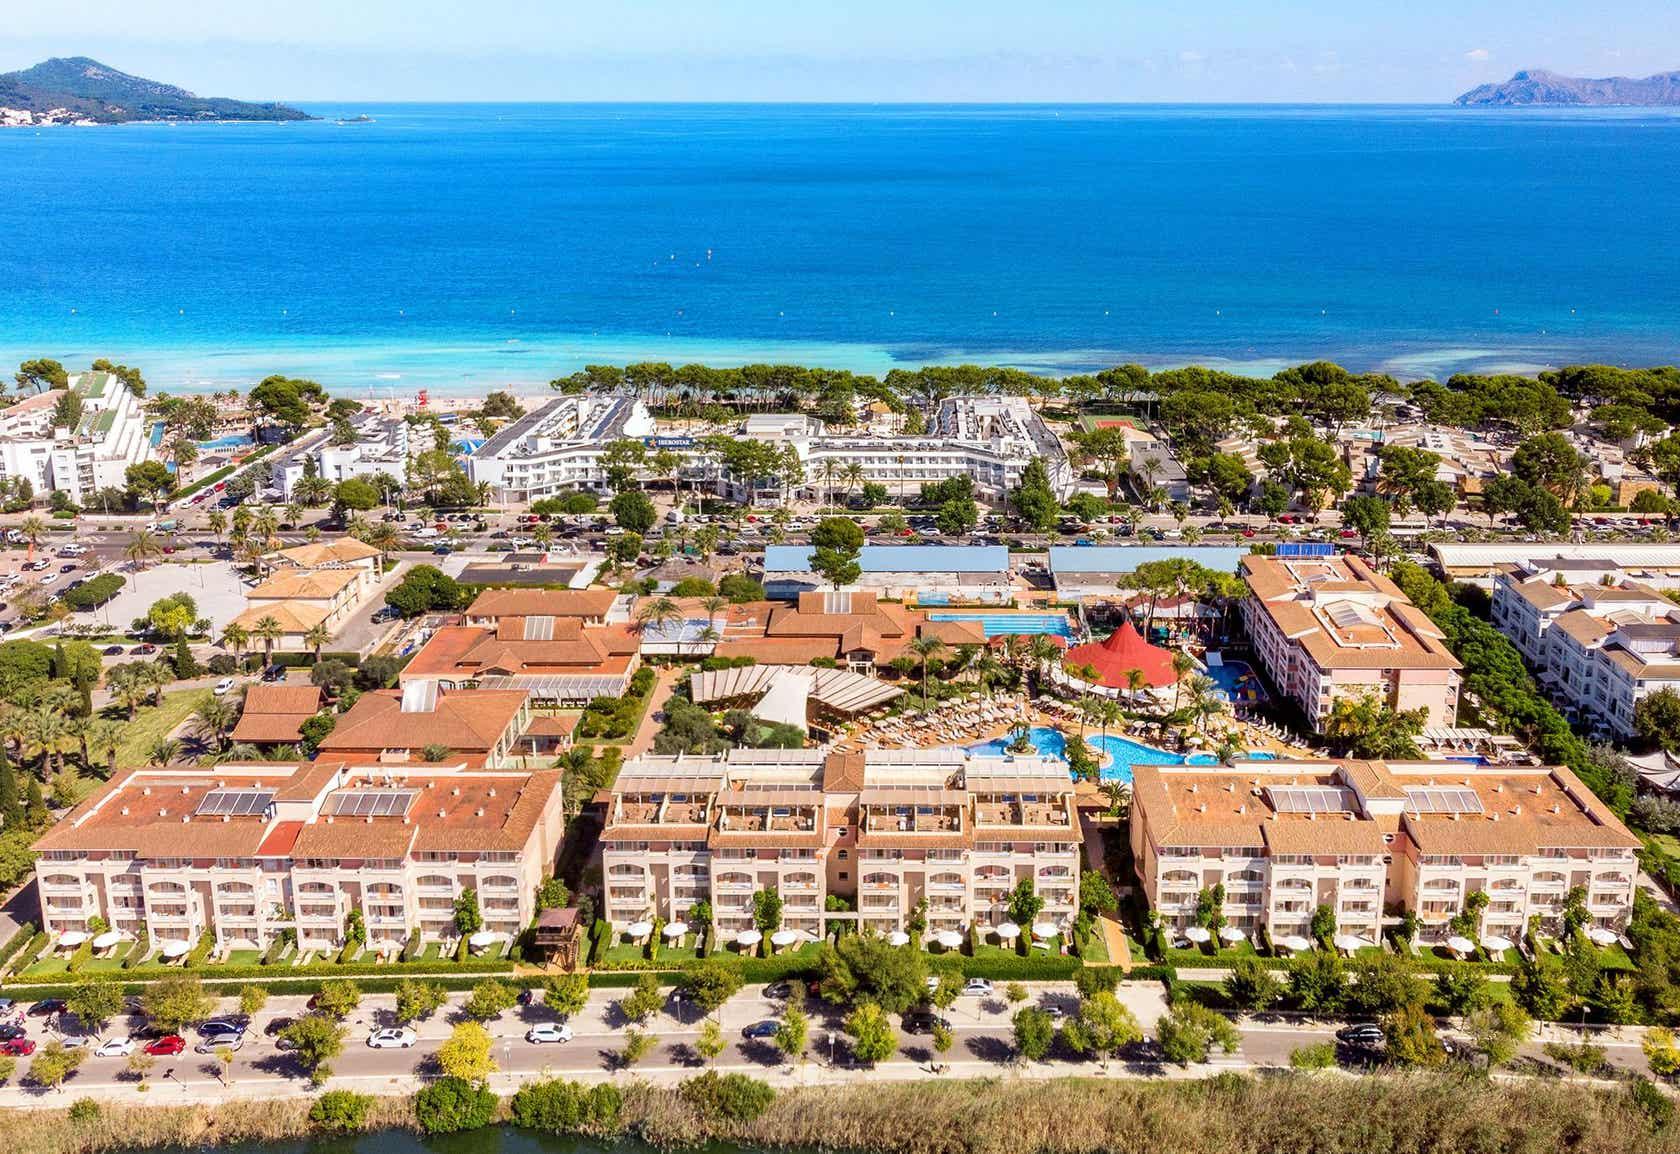 Viva Blue Apartments